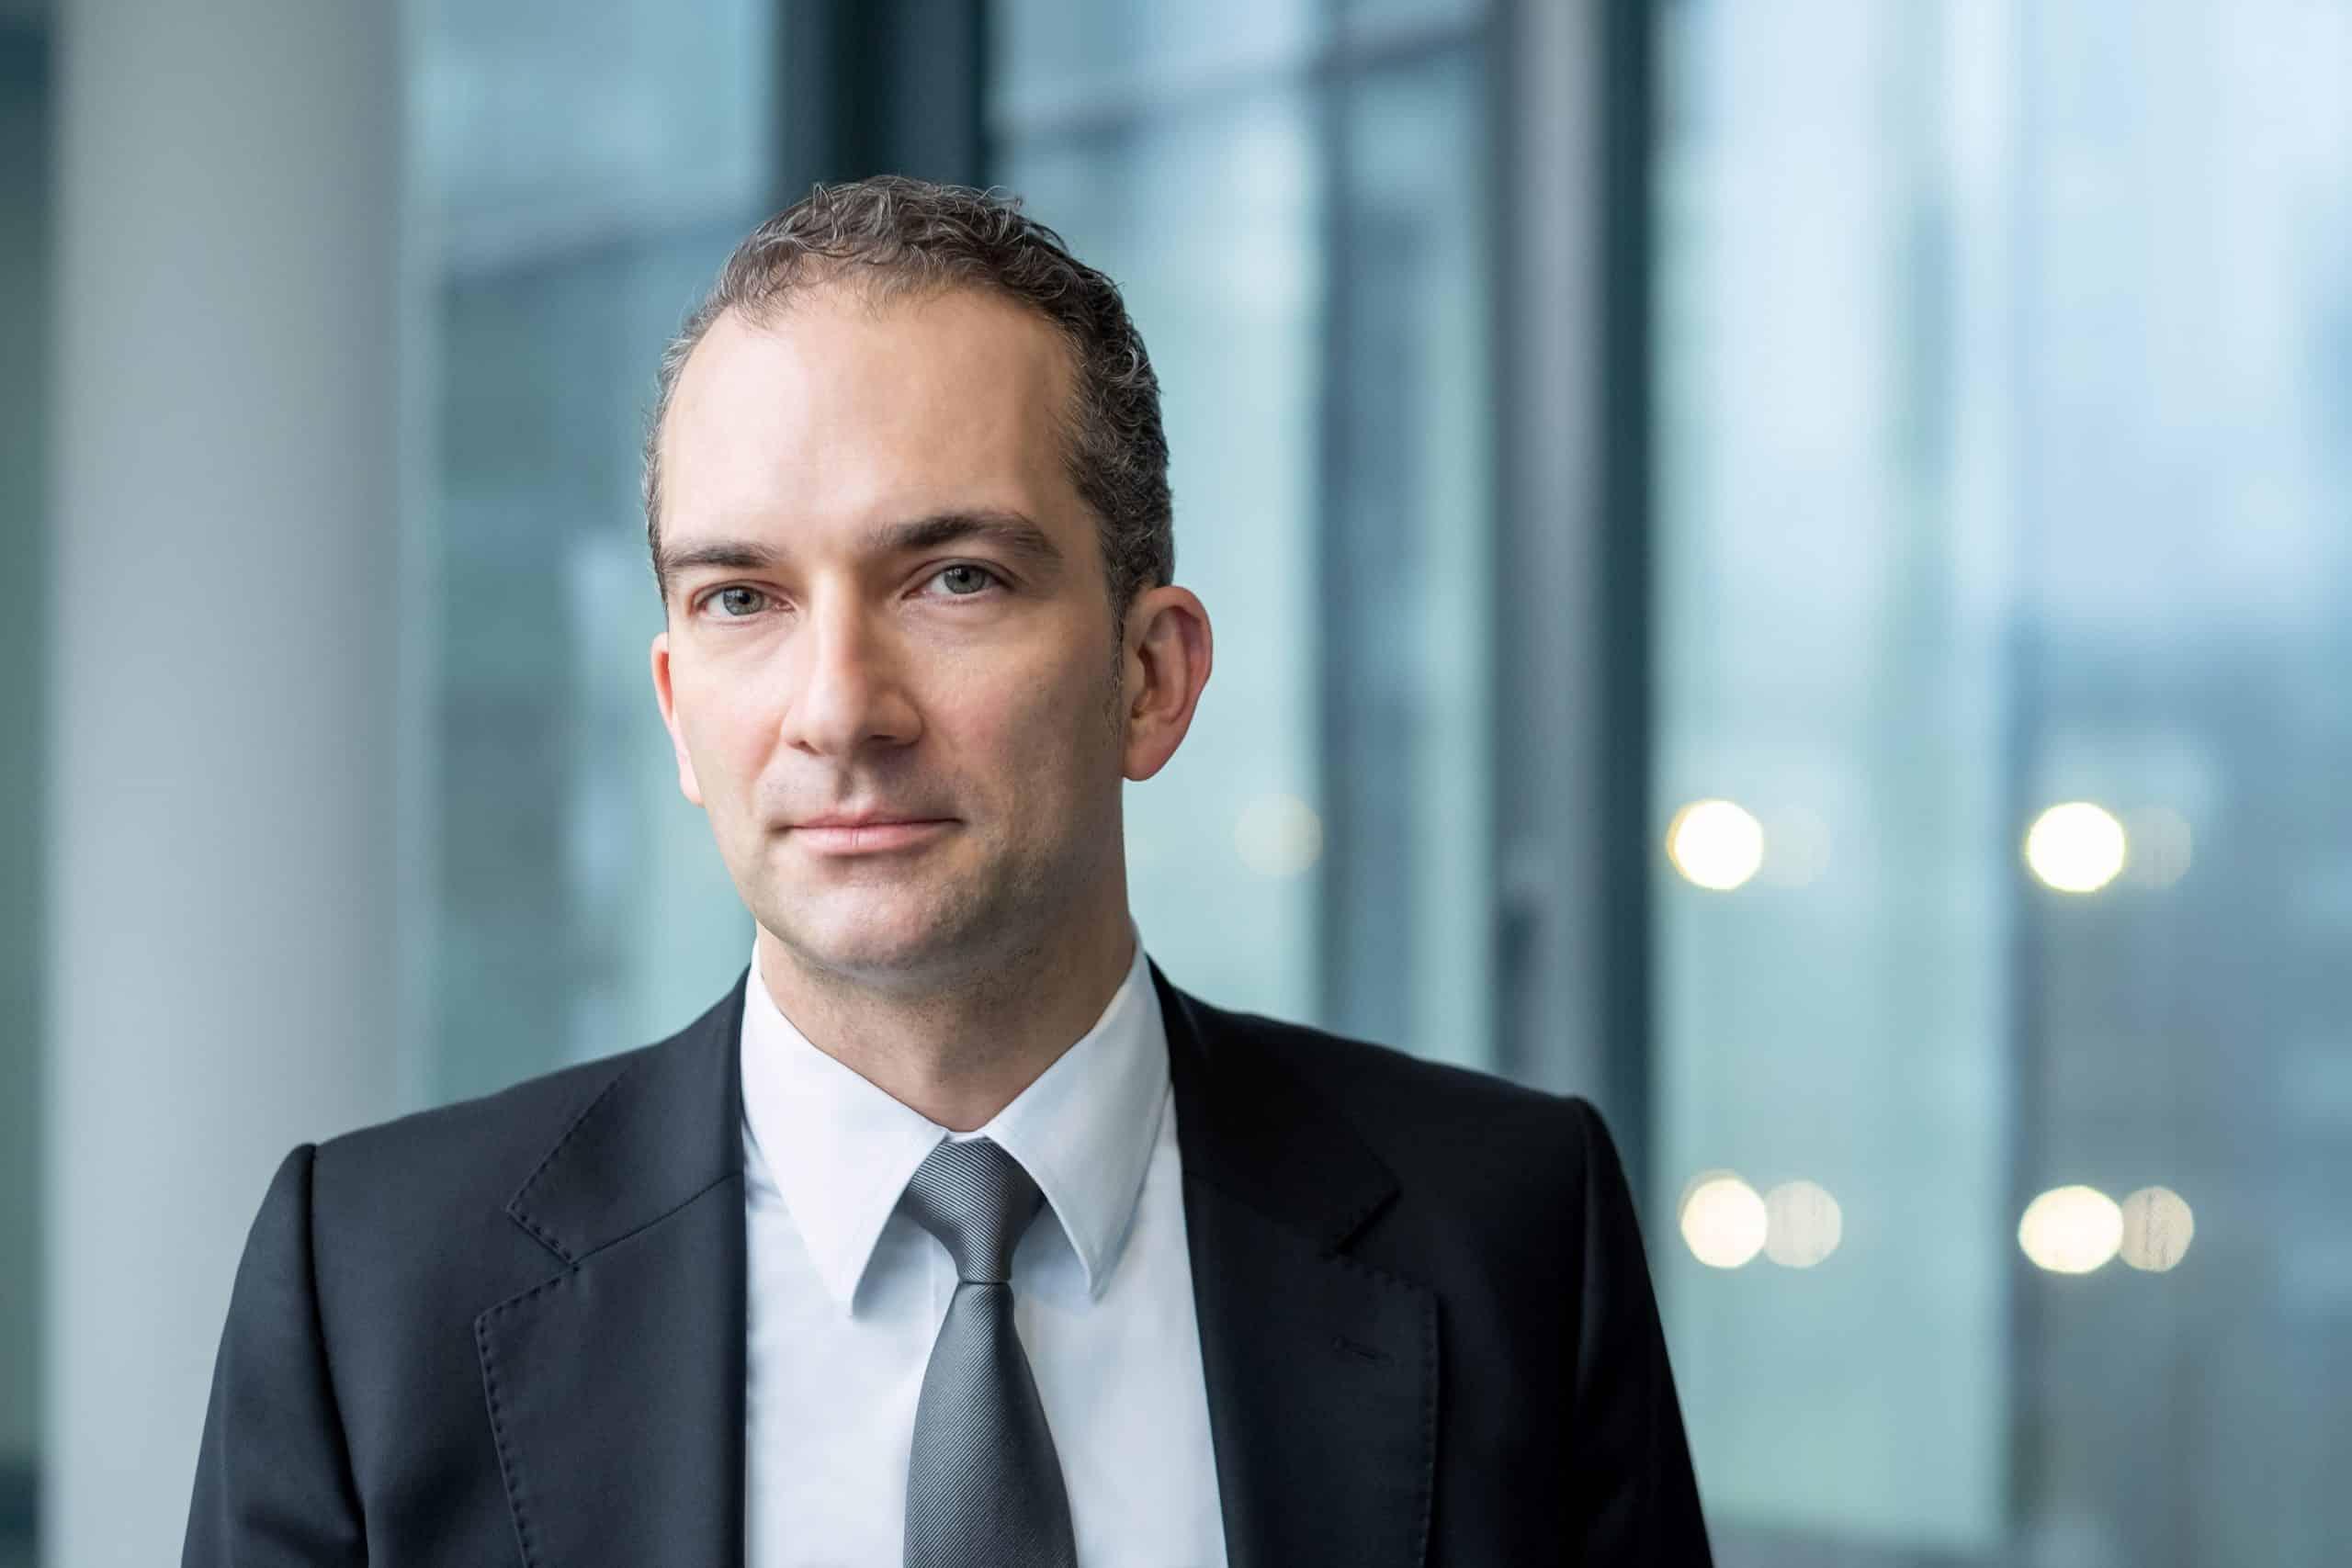 Rechtsanwalt Sascha Borowski, BBR